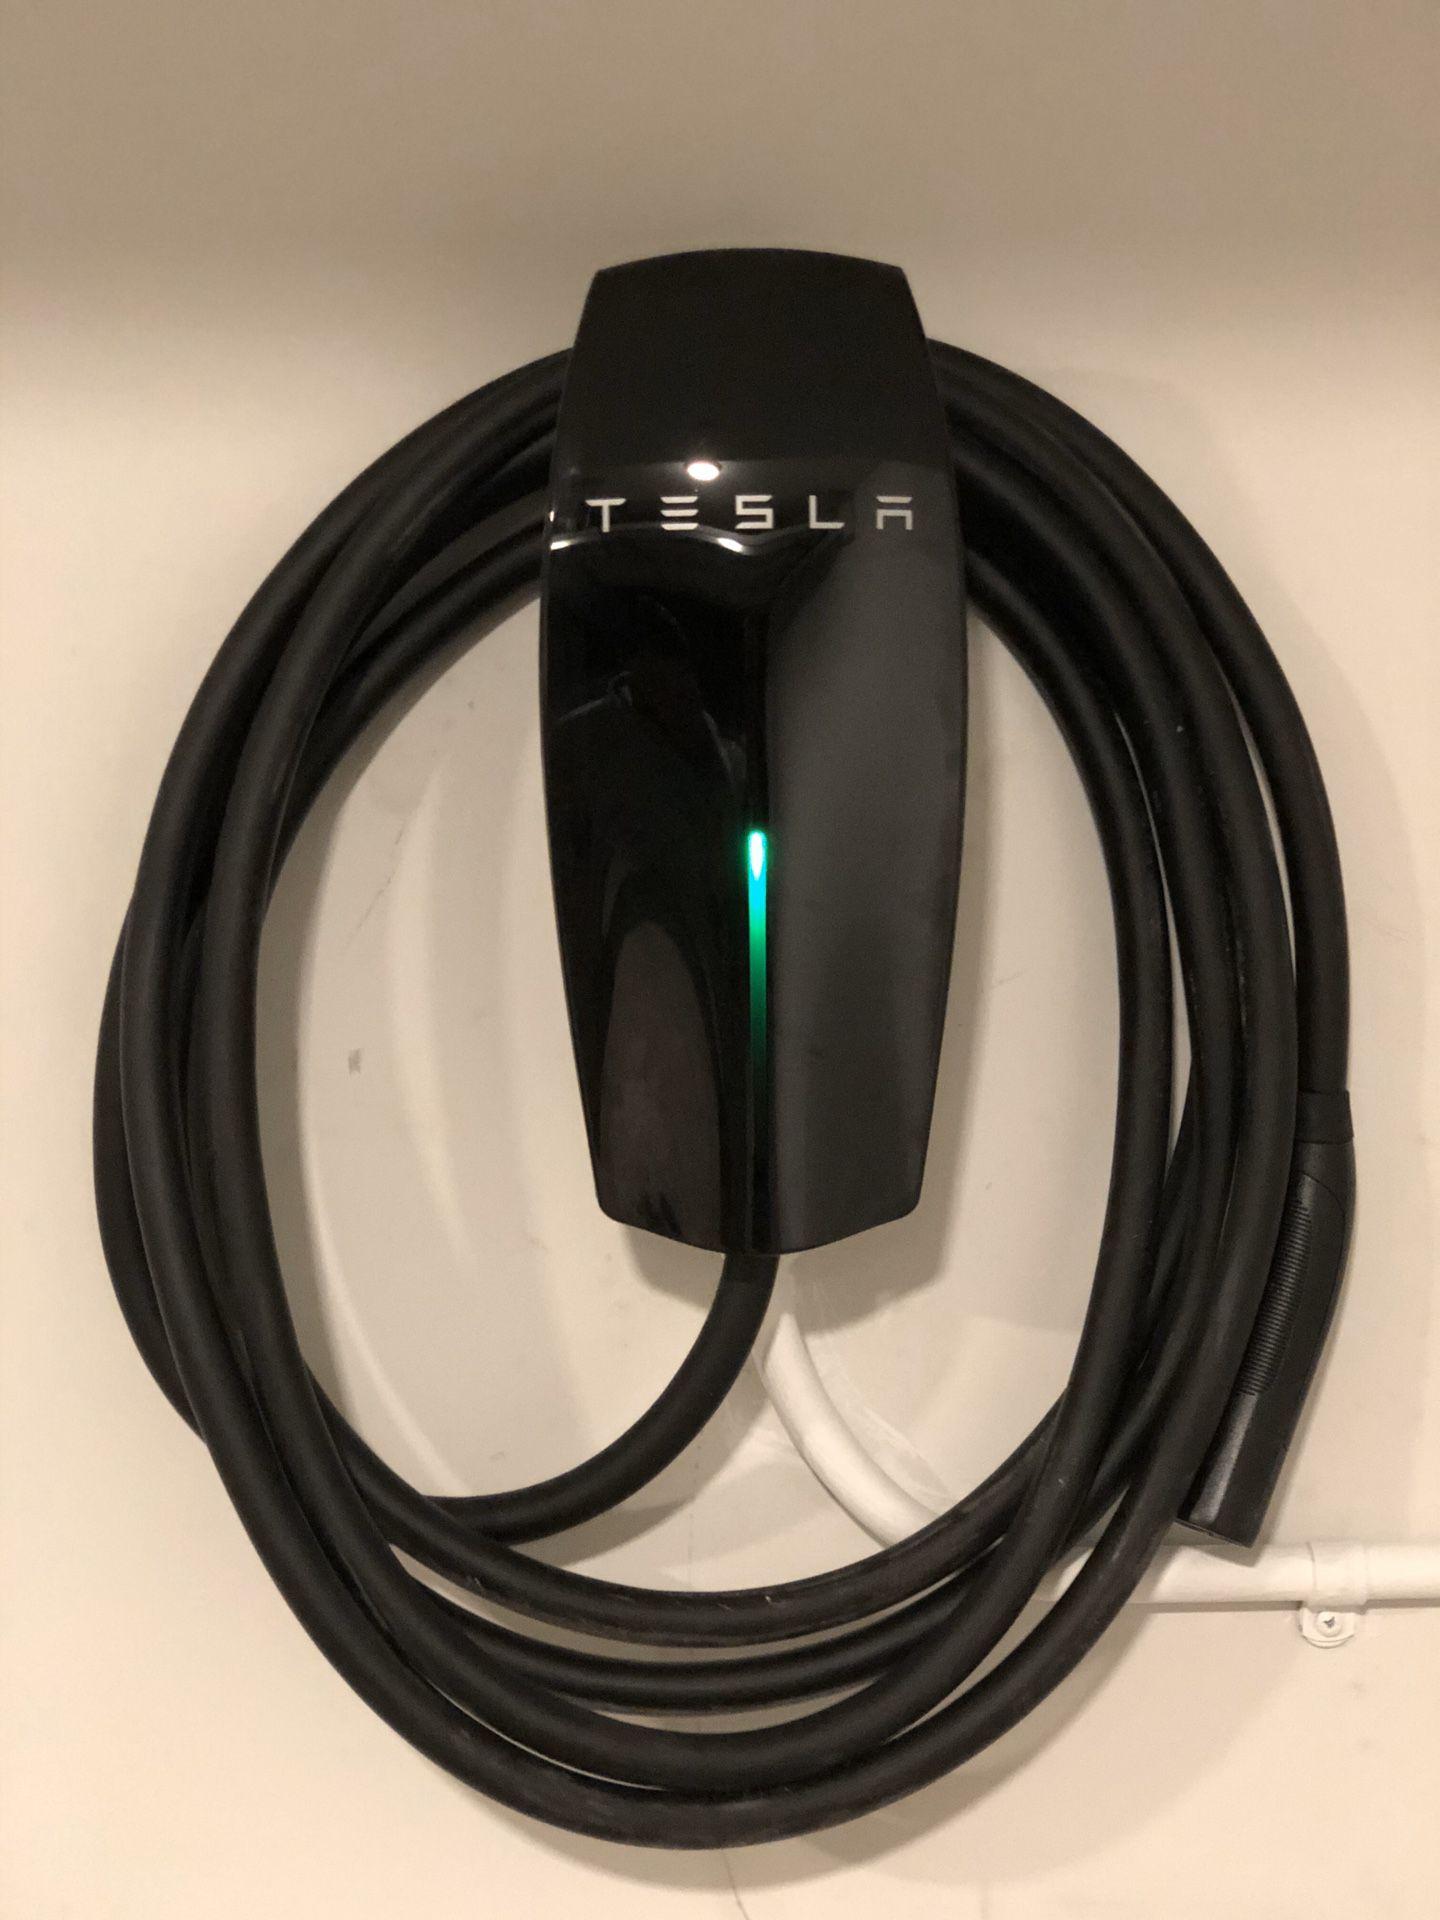 Tesla Ev Charger